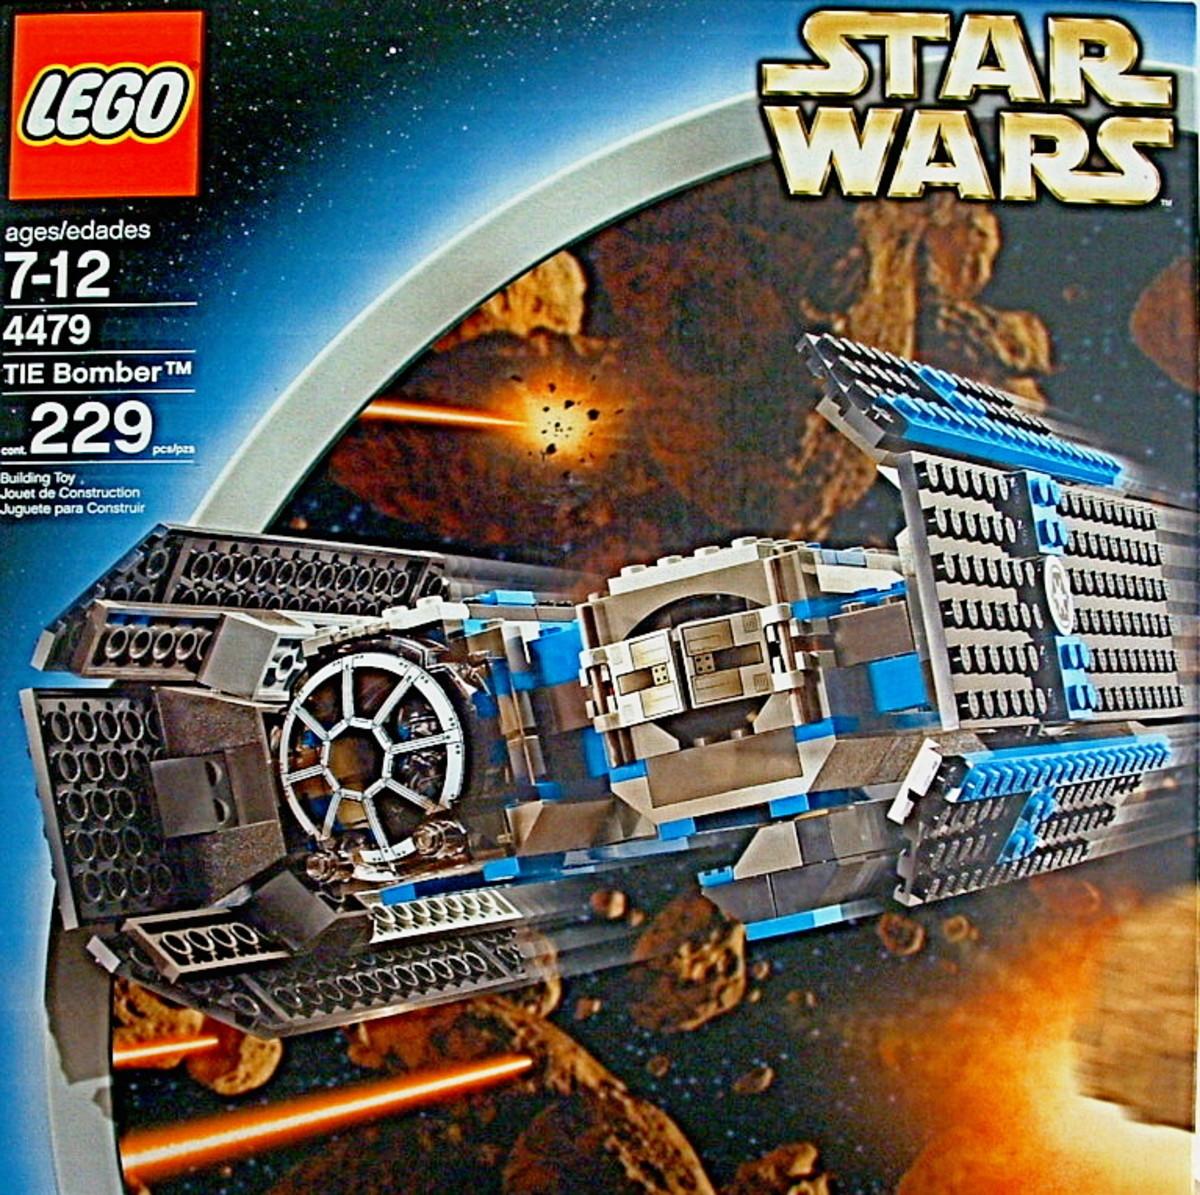 LEGO Star Wars TIE Bomber 4479 Box